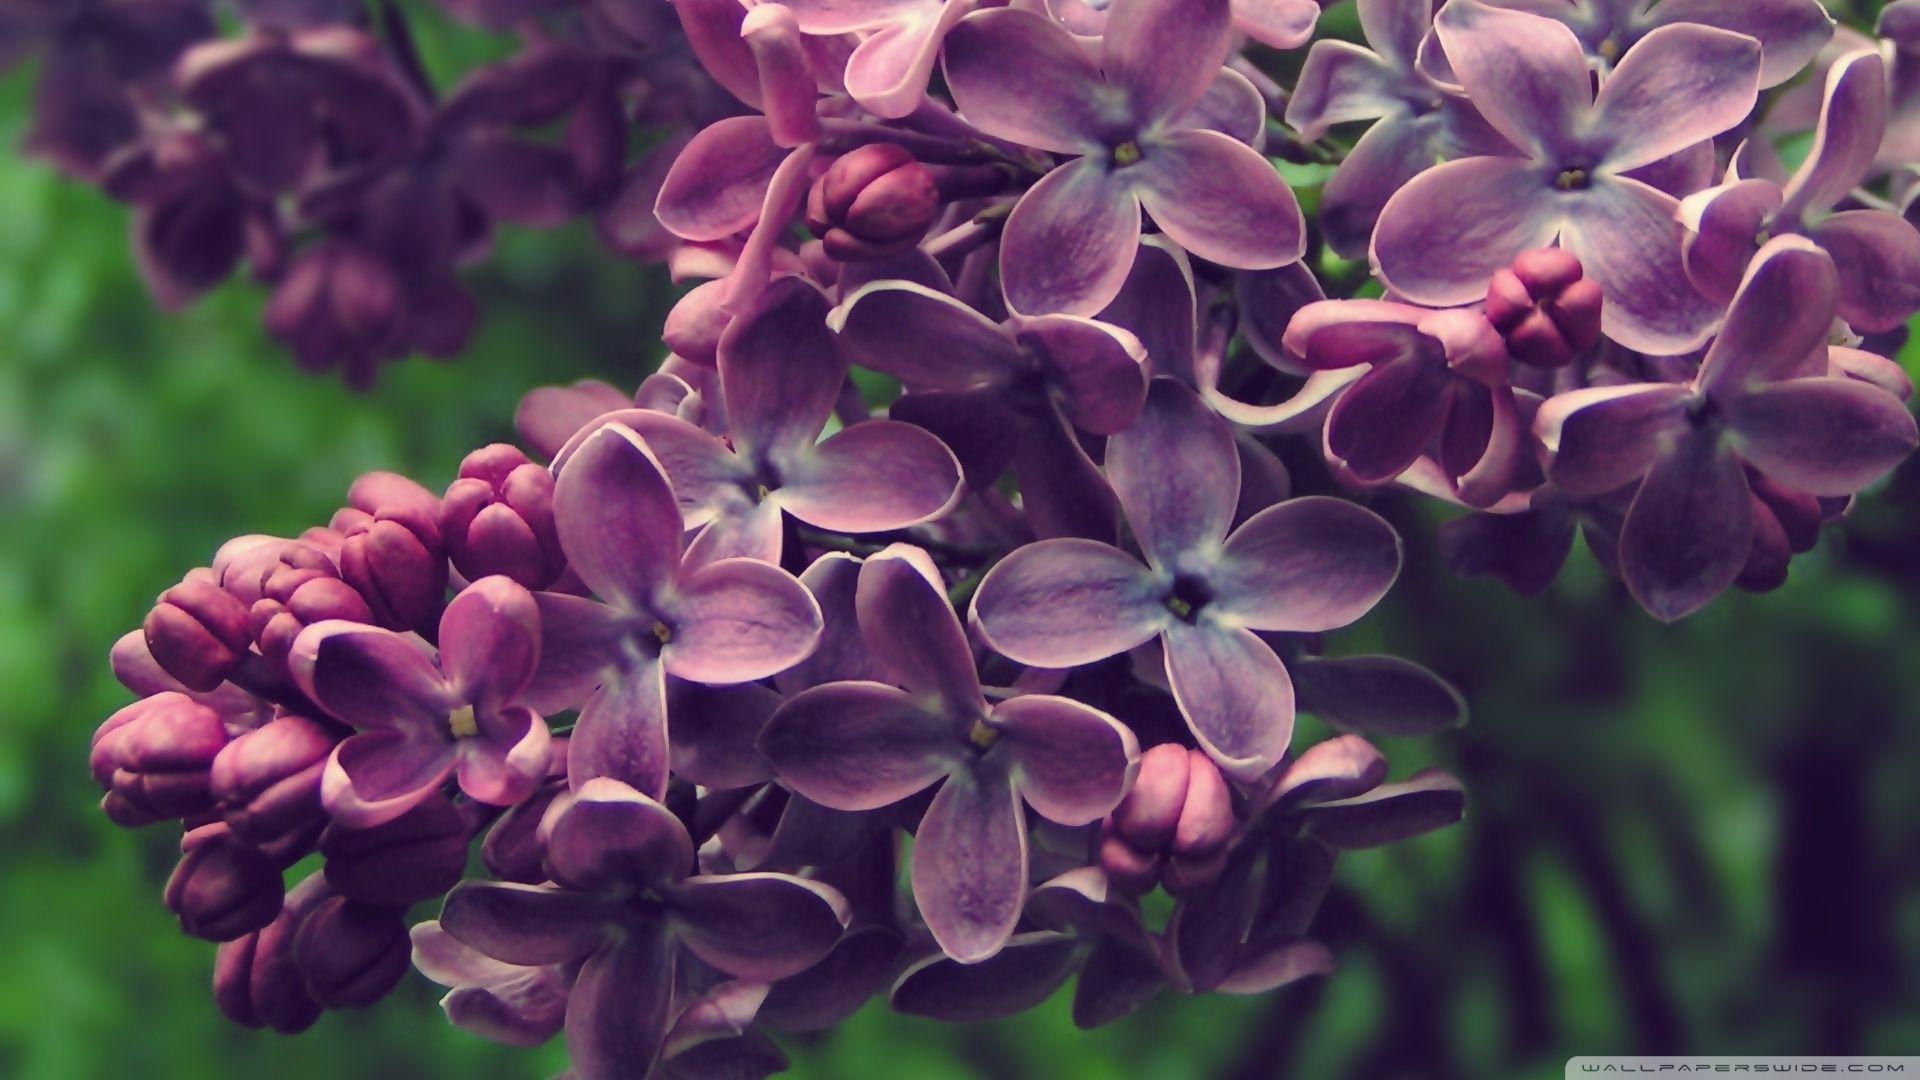 Lilac wallpaper image